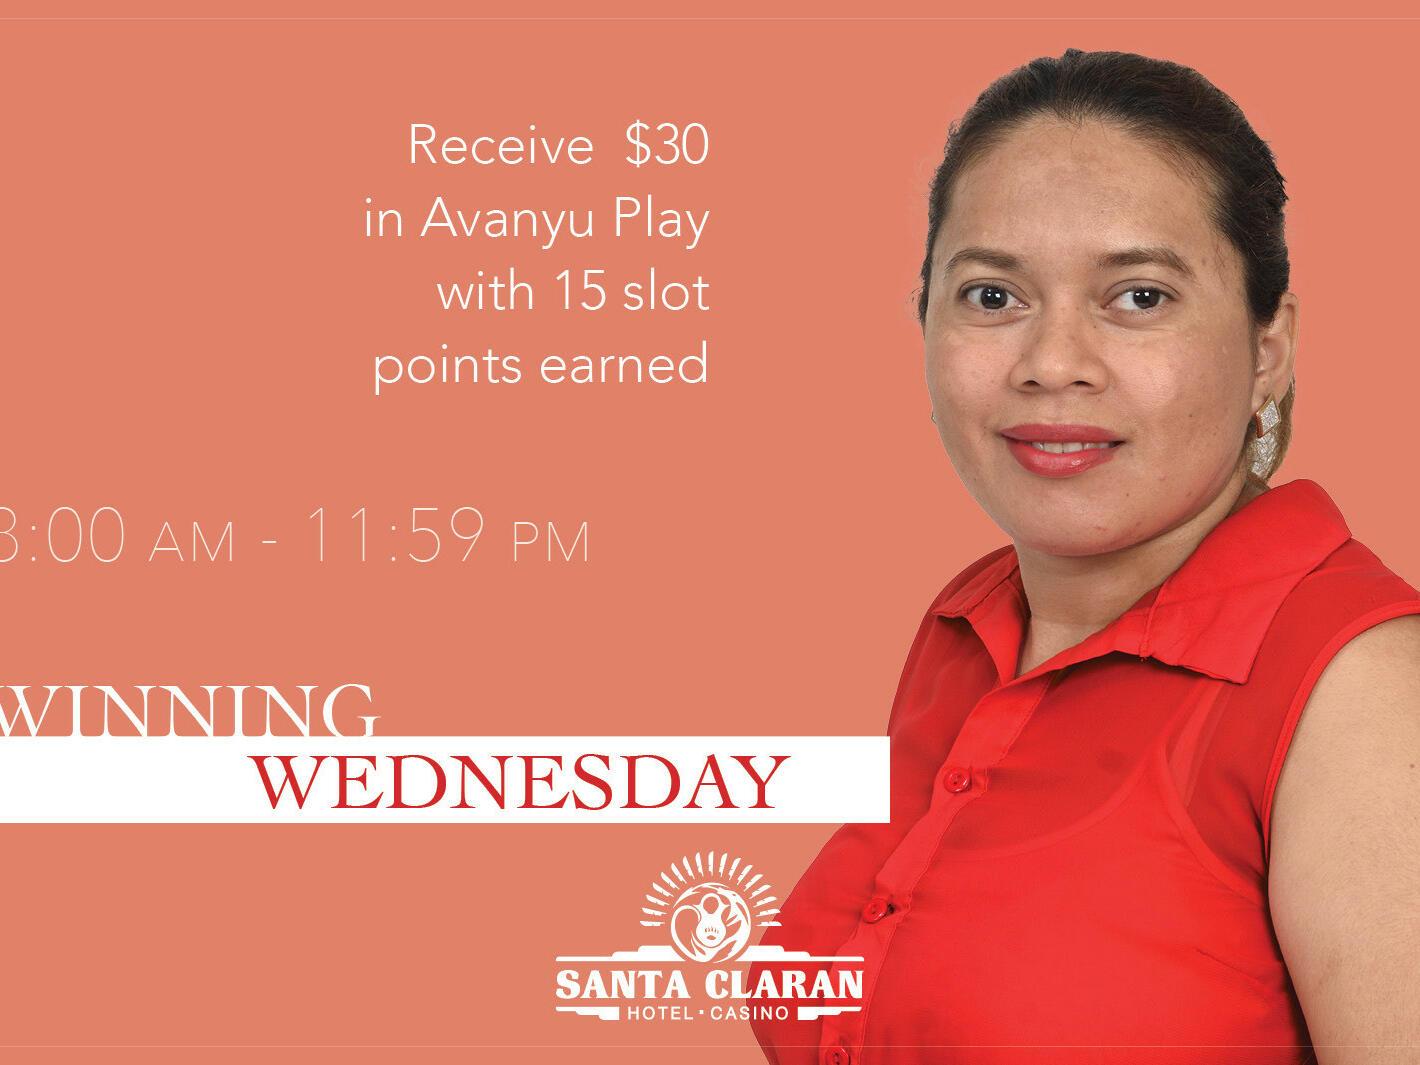 Poster of Winning Wednesday at Santa Claran Hotel Casino